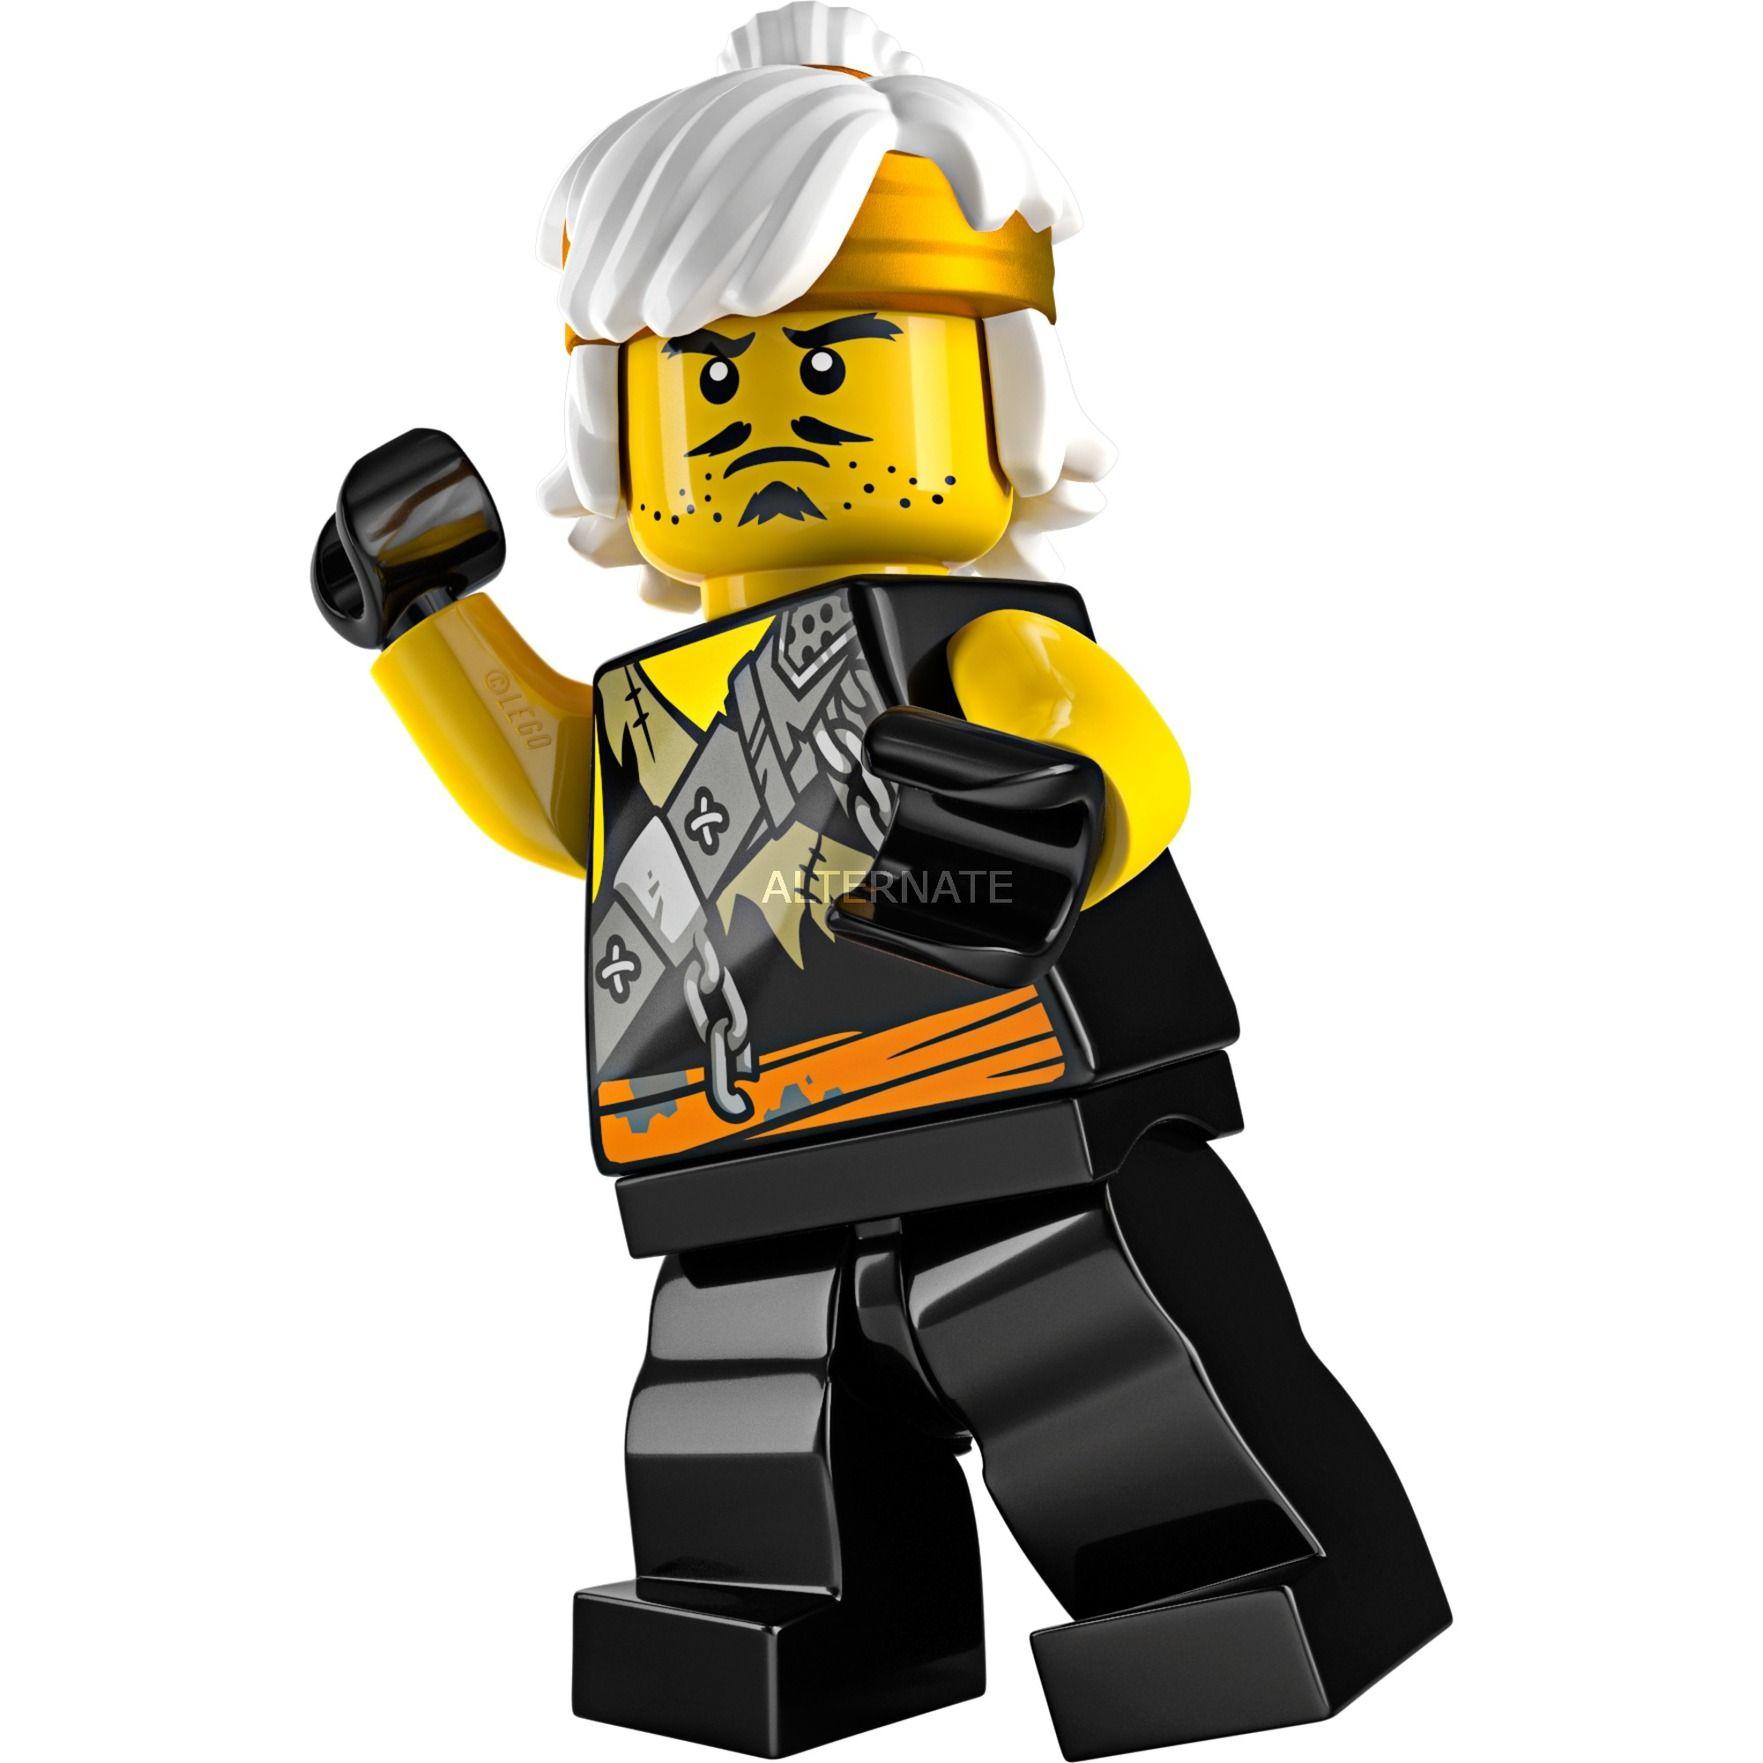 Young Wu Lego Dragon Lego Ninjago Ninjago Fantasy chinese armor by admirawijaya on deviantart. pinterest